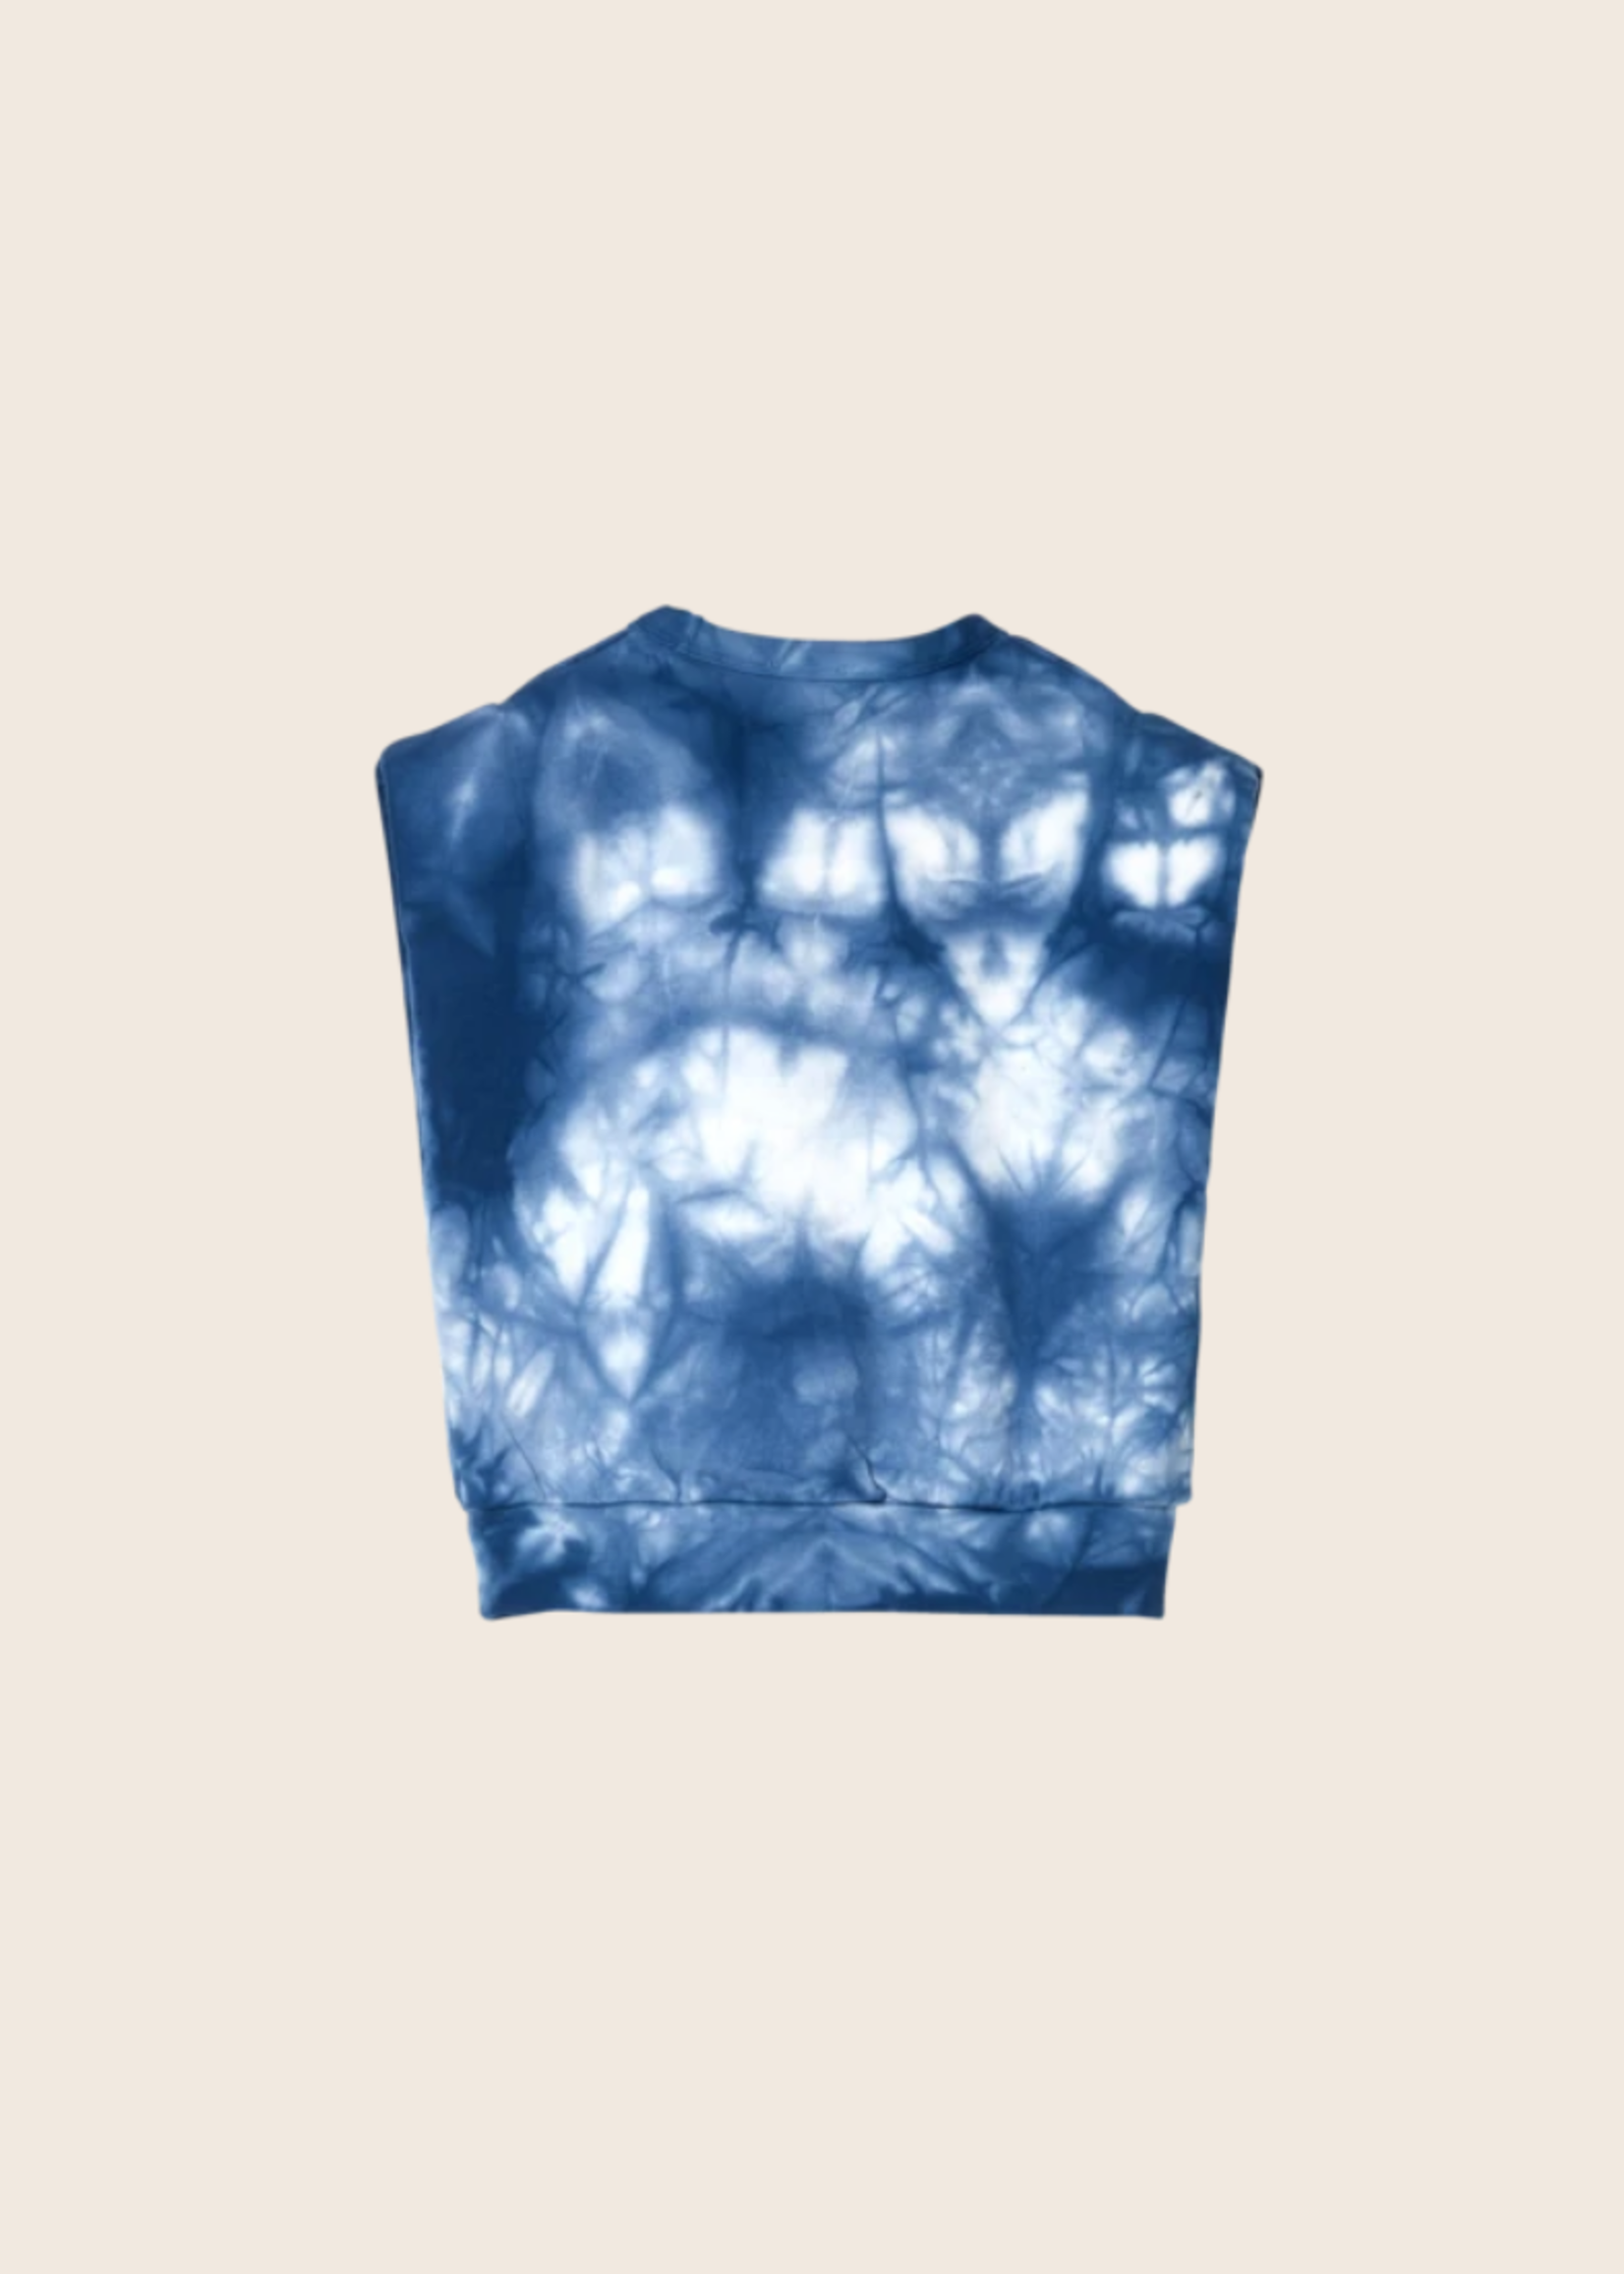 FINGER IN THE NOSE CAROL Work Blue Tie & Dye - Sleeveless Sweater